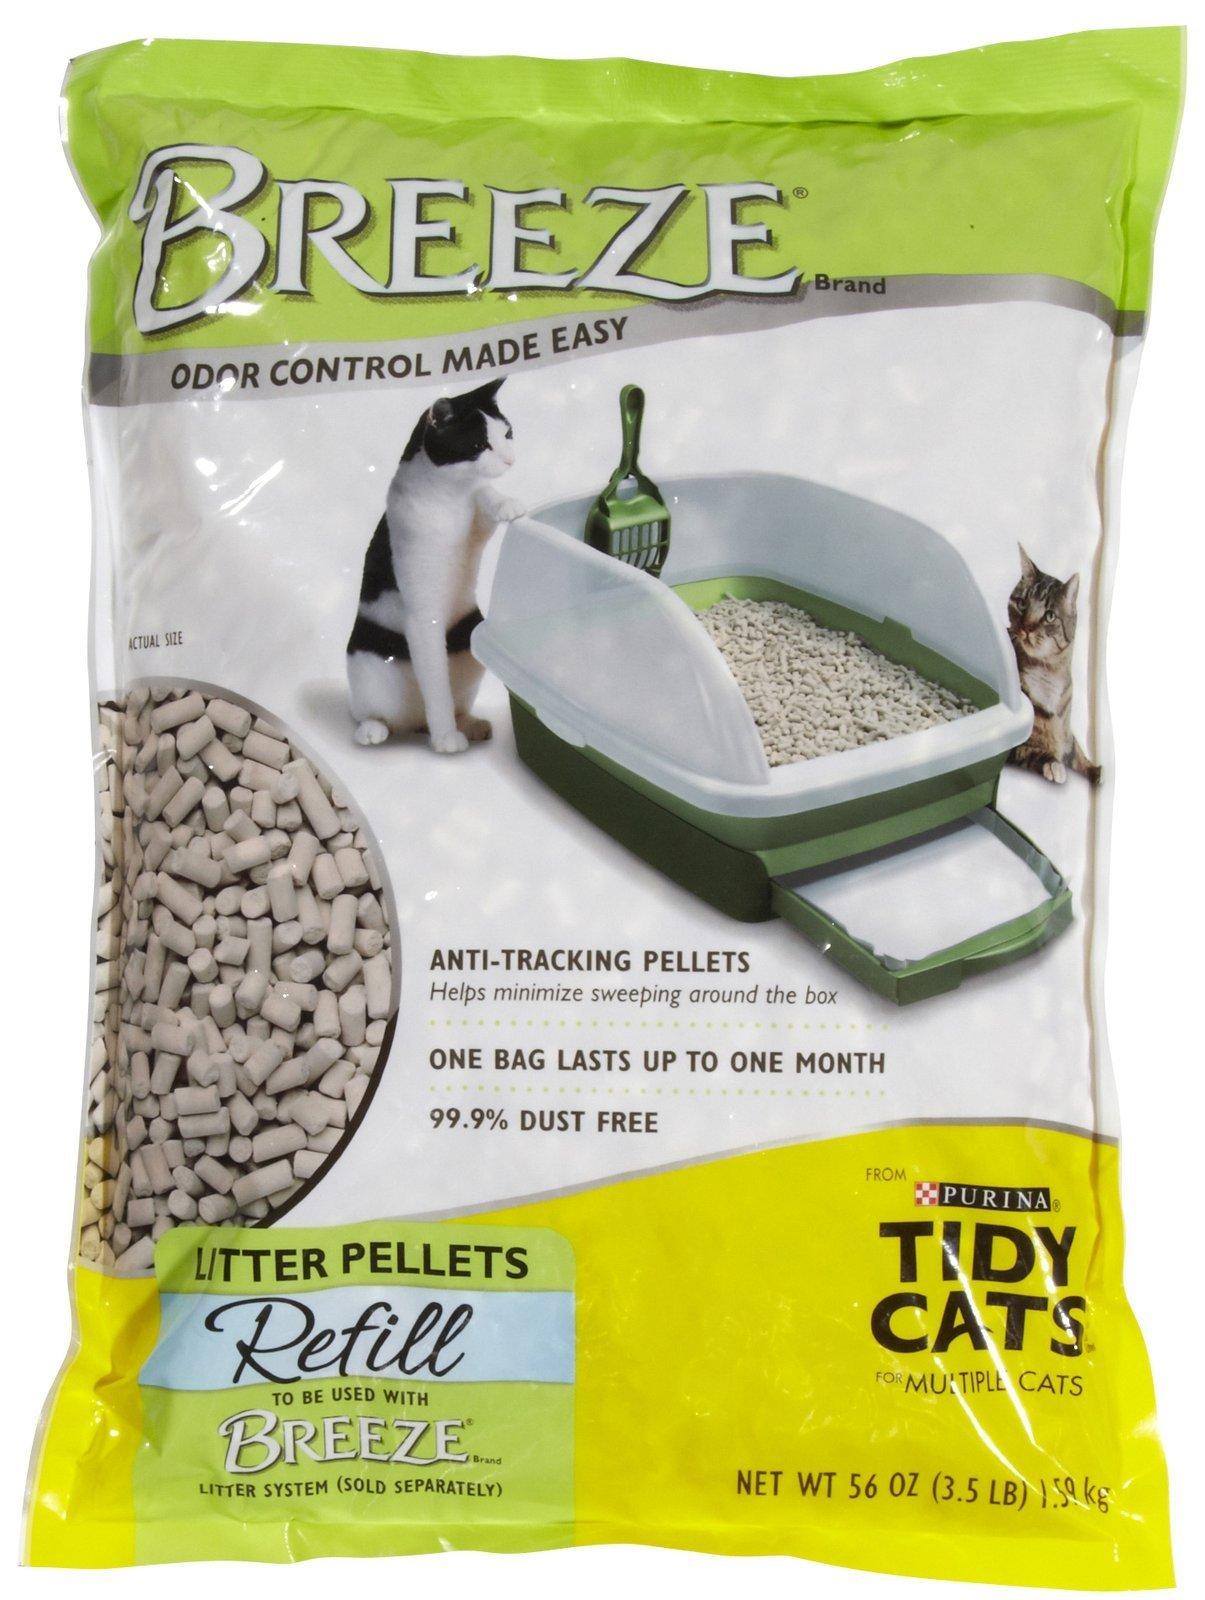 Tidy Cats Breeze Cat Litter Pellets - 3.5 lbs 1 Pack